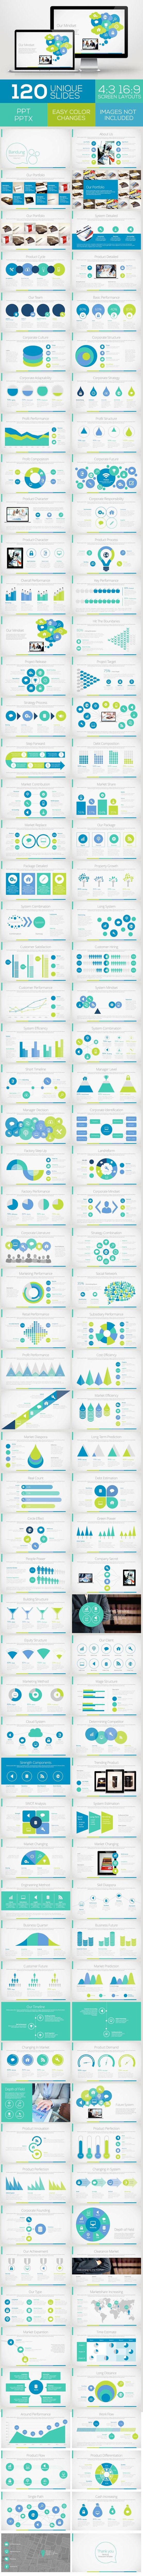 Bandung Powerpoint Template Volume 3 - Business PowerPoint Templates